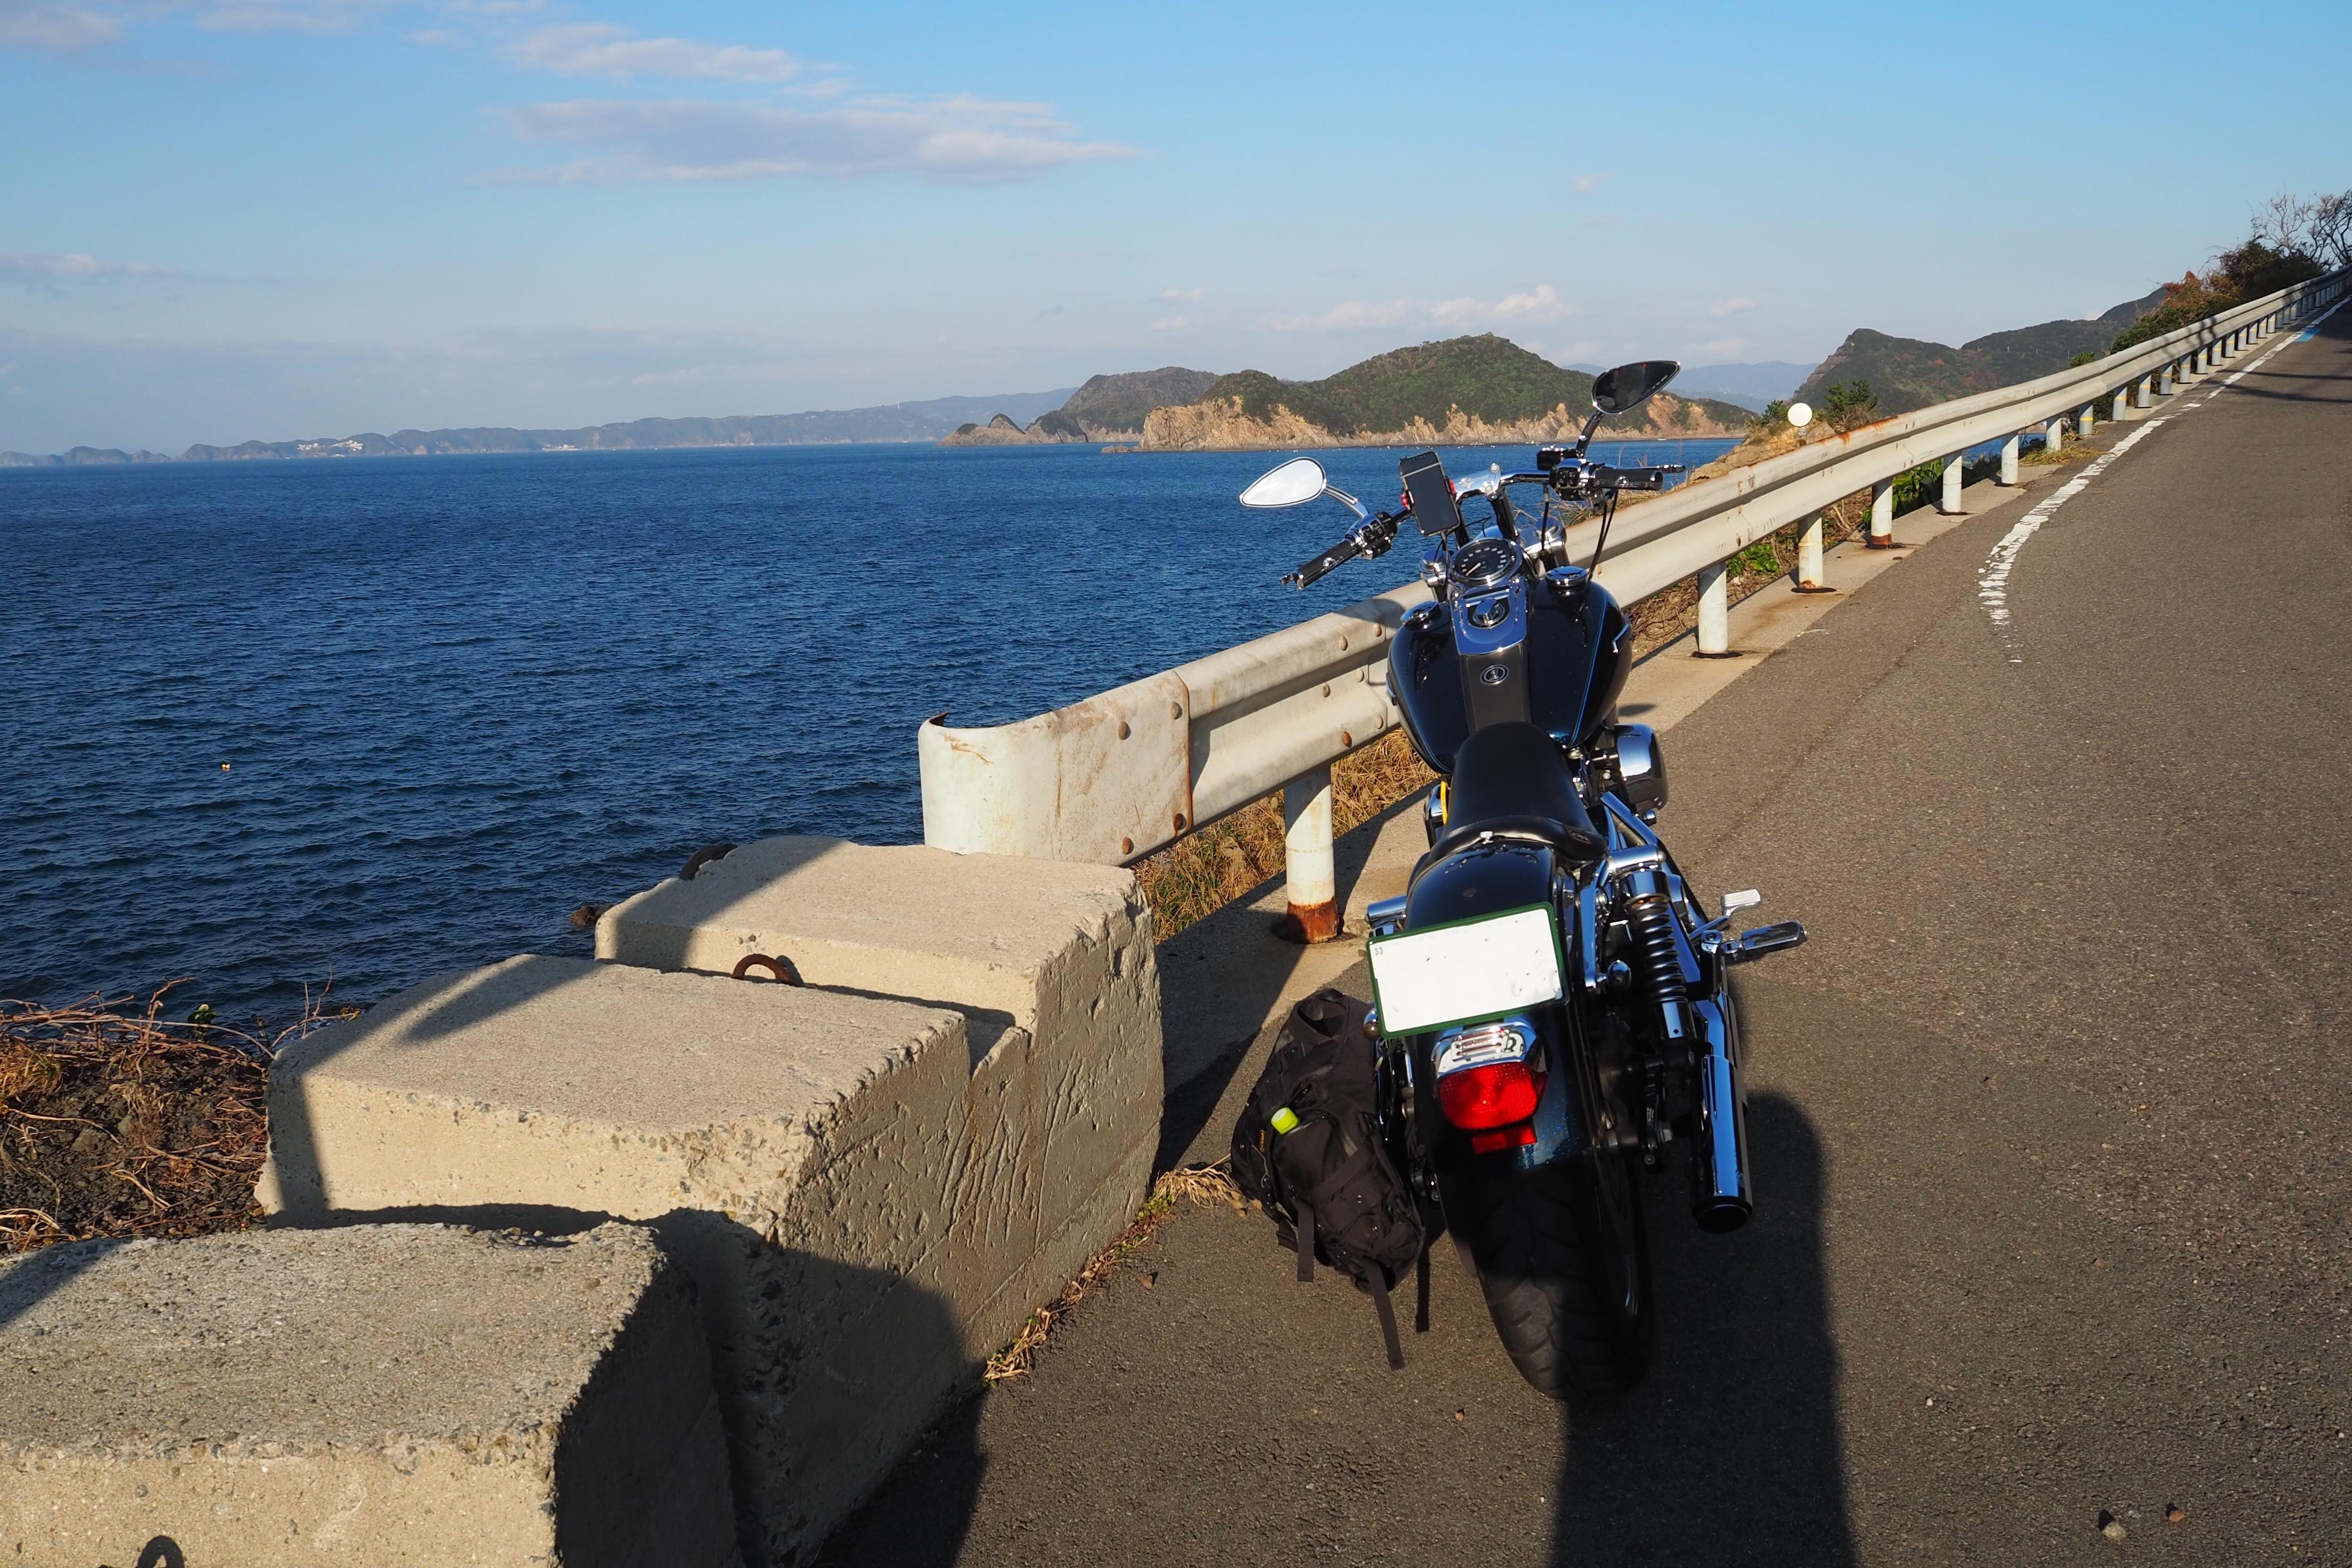 harleydavidson-motorcycle-touring-blog-yuratown-coastline.jpg